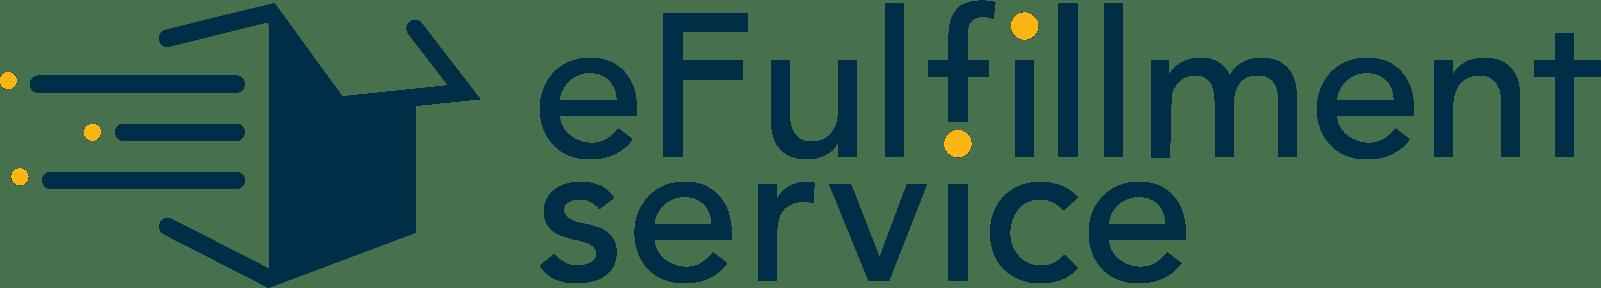 eFulfillment Service